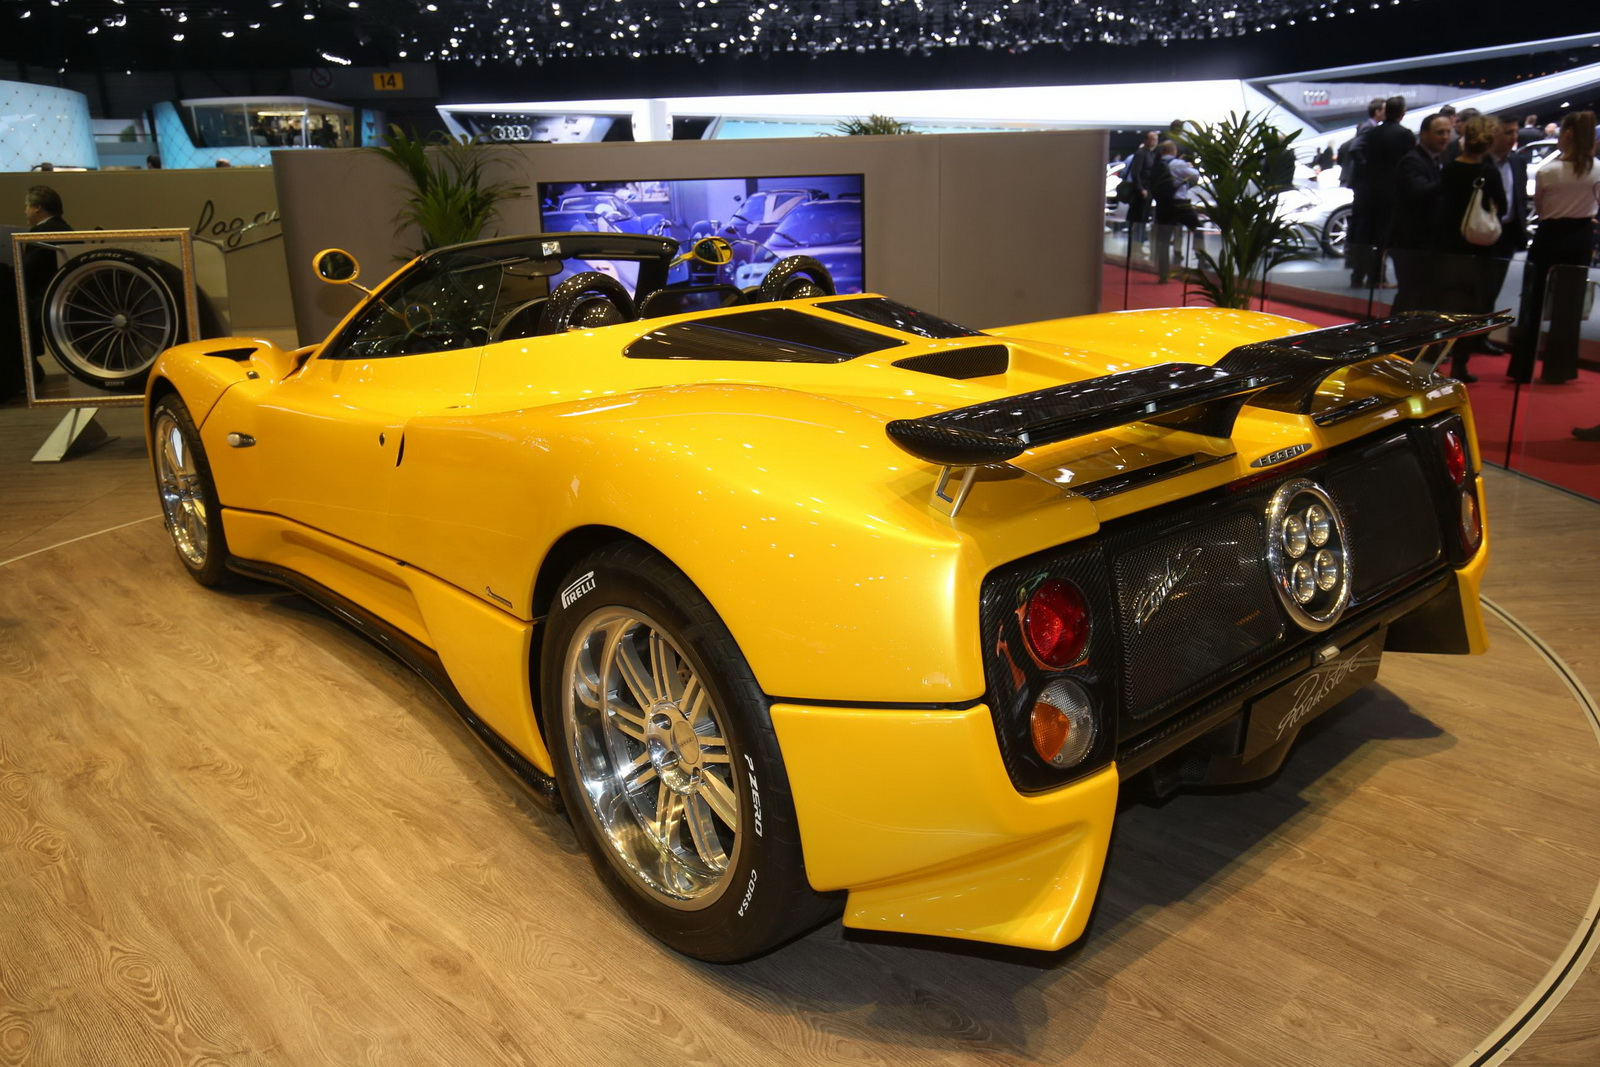 DS pagani huayra roadster : Pagani Huayra Roadster Makes Its World Premiere in Geneva